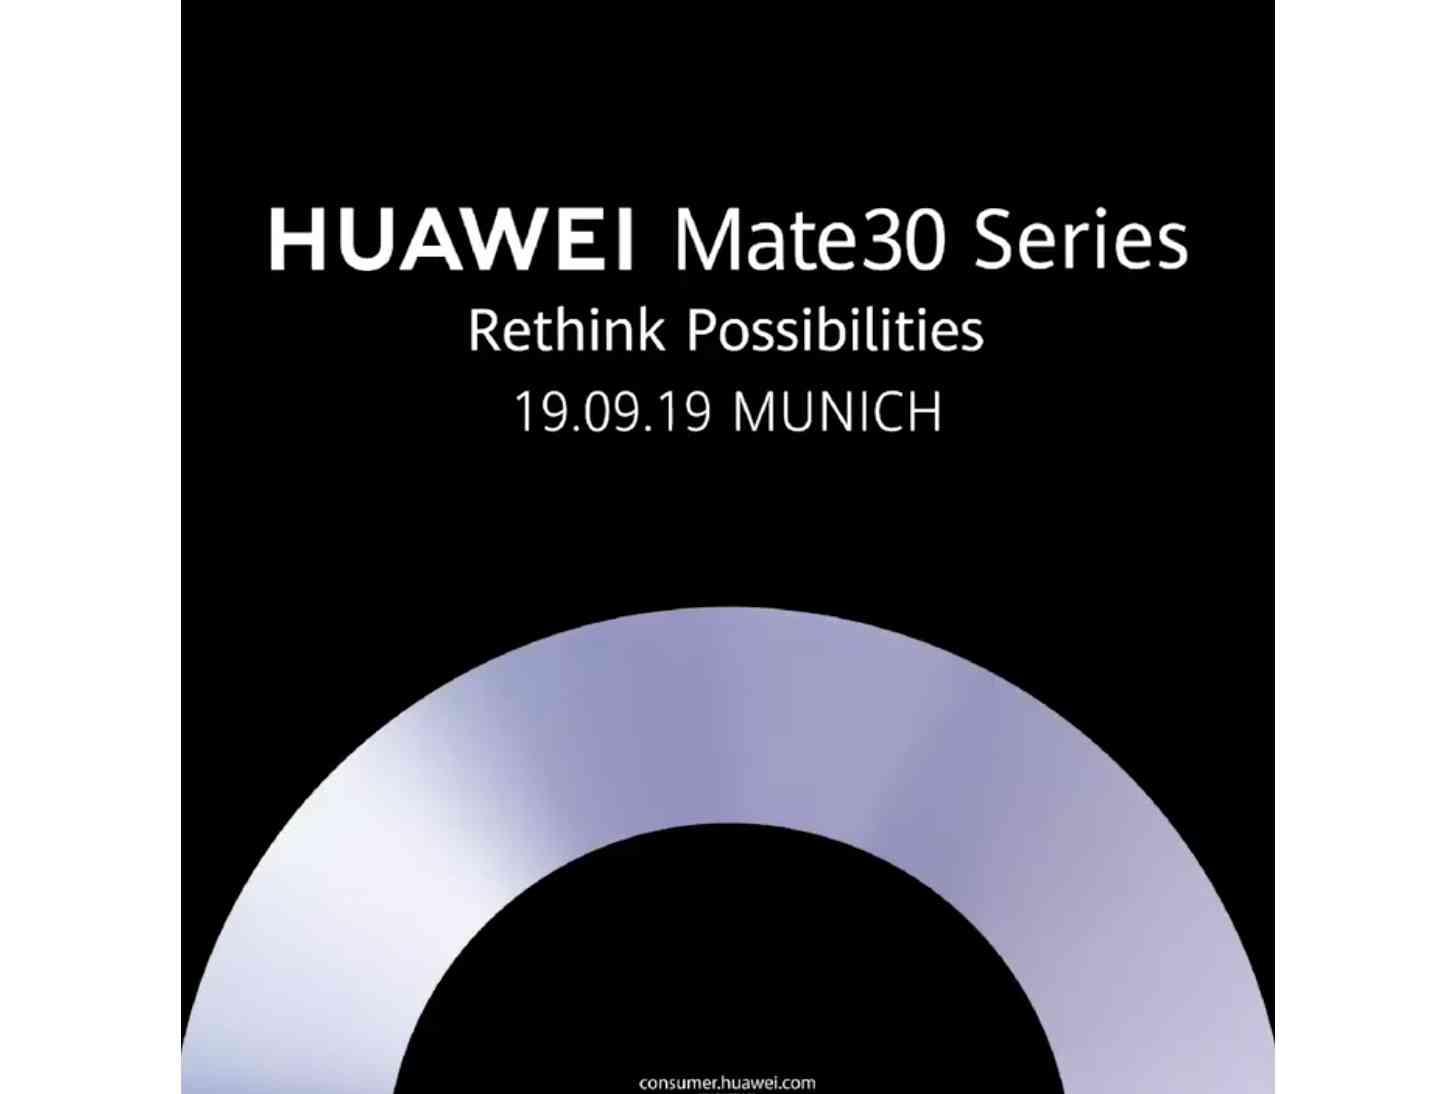 Huawei Mate 30 event teaser